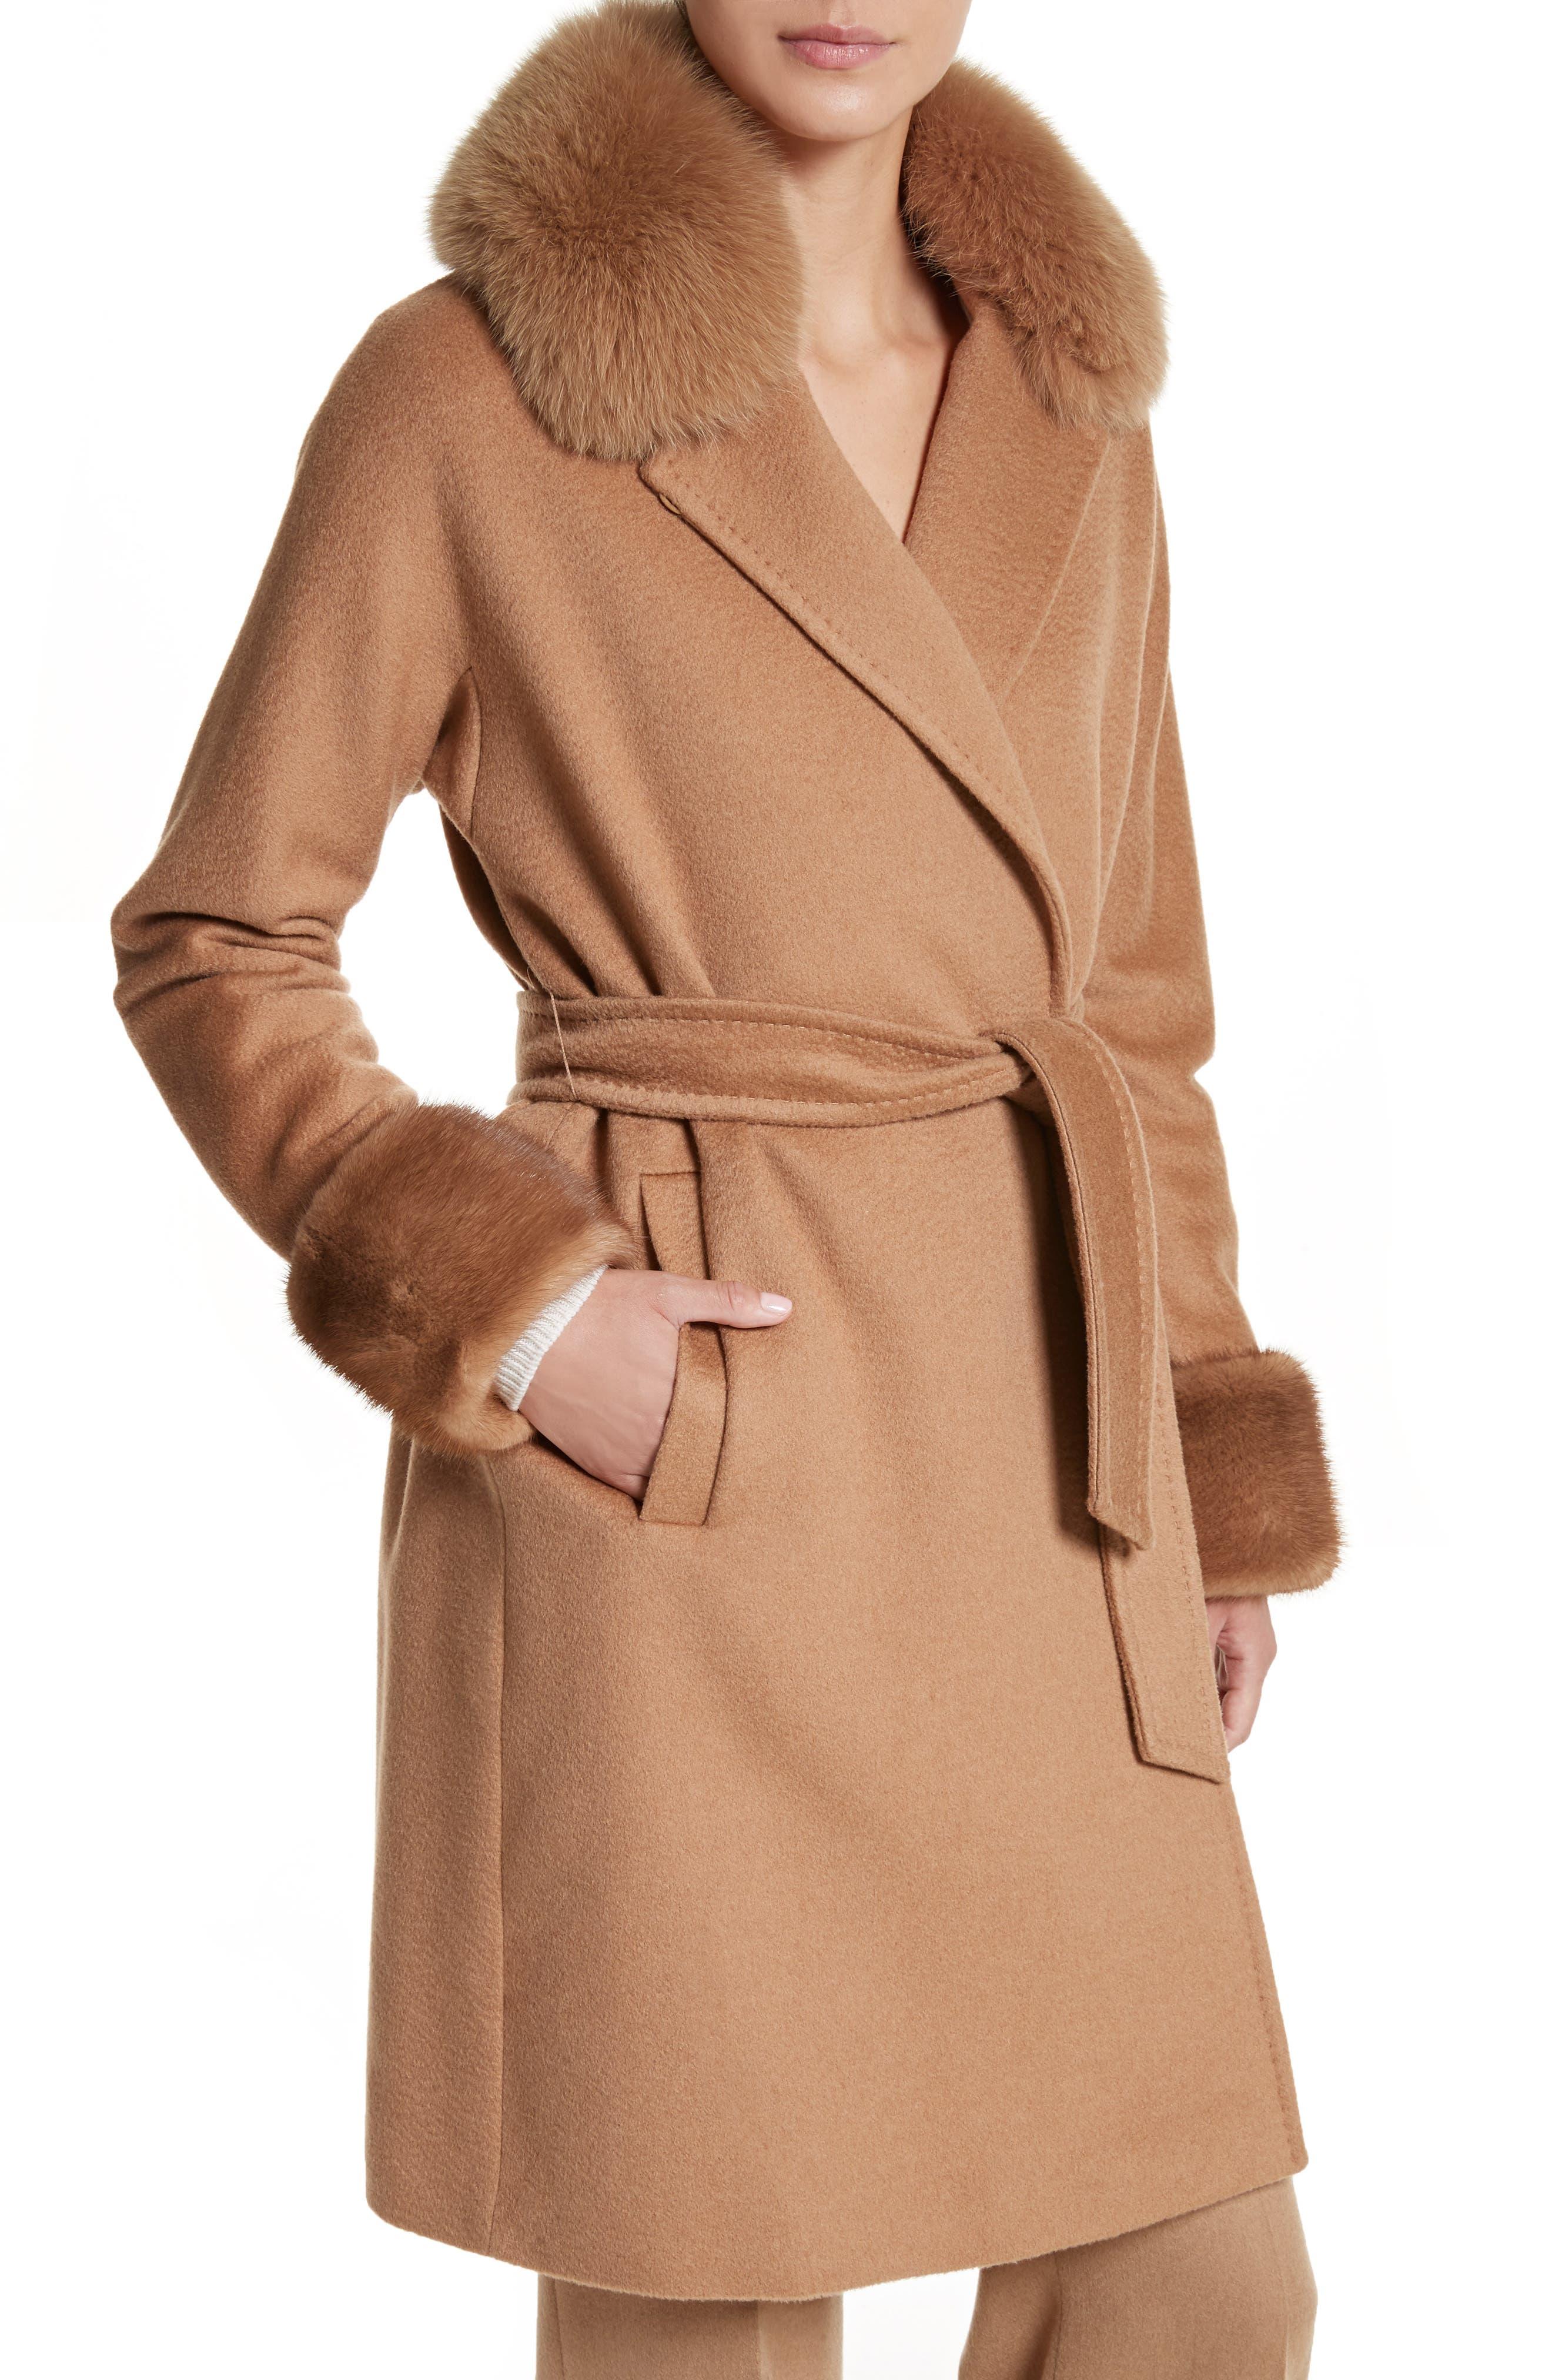 Camel Hair Coat with Genuine Fox Fur & Genuine Mink Fur Trim,                             Alternate thumbnail 4, color,                             232